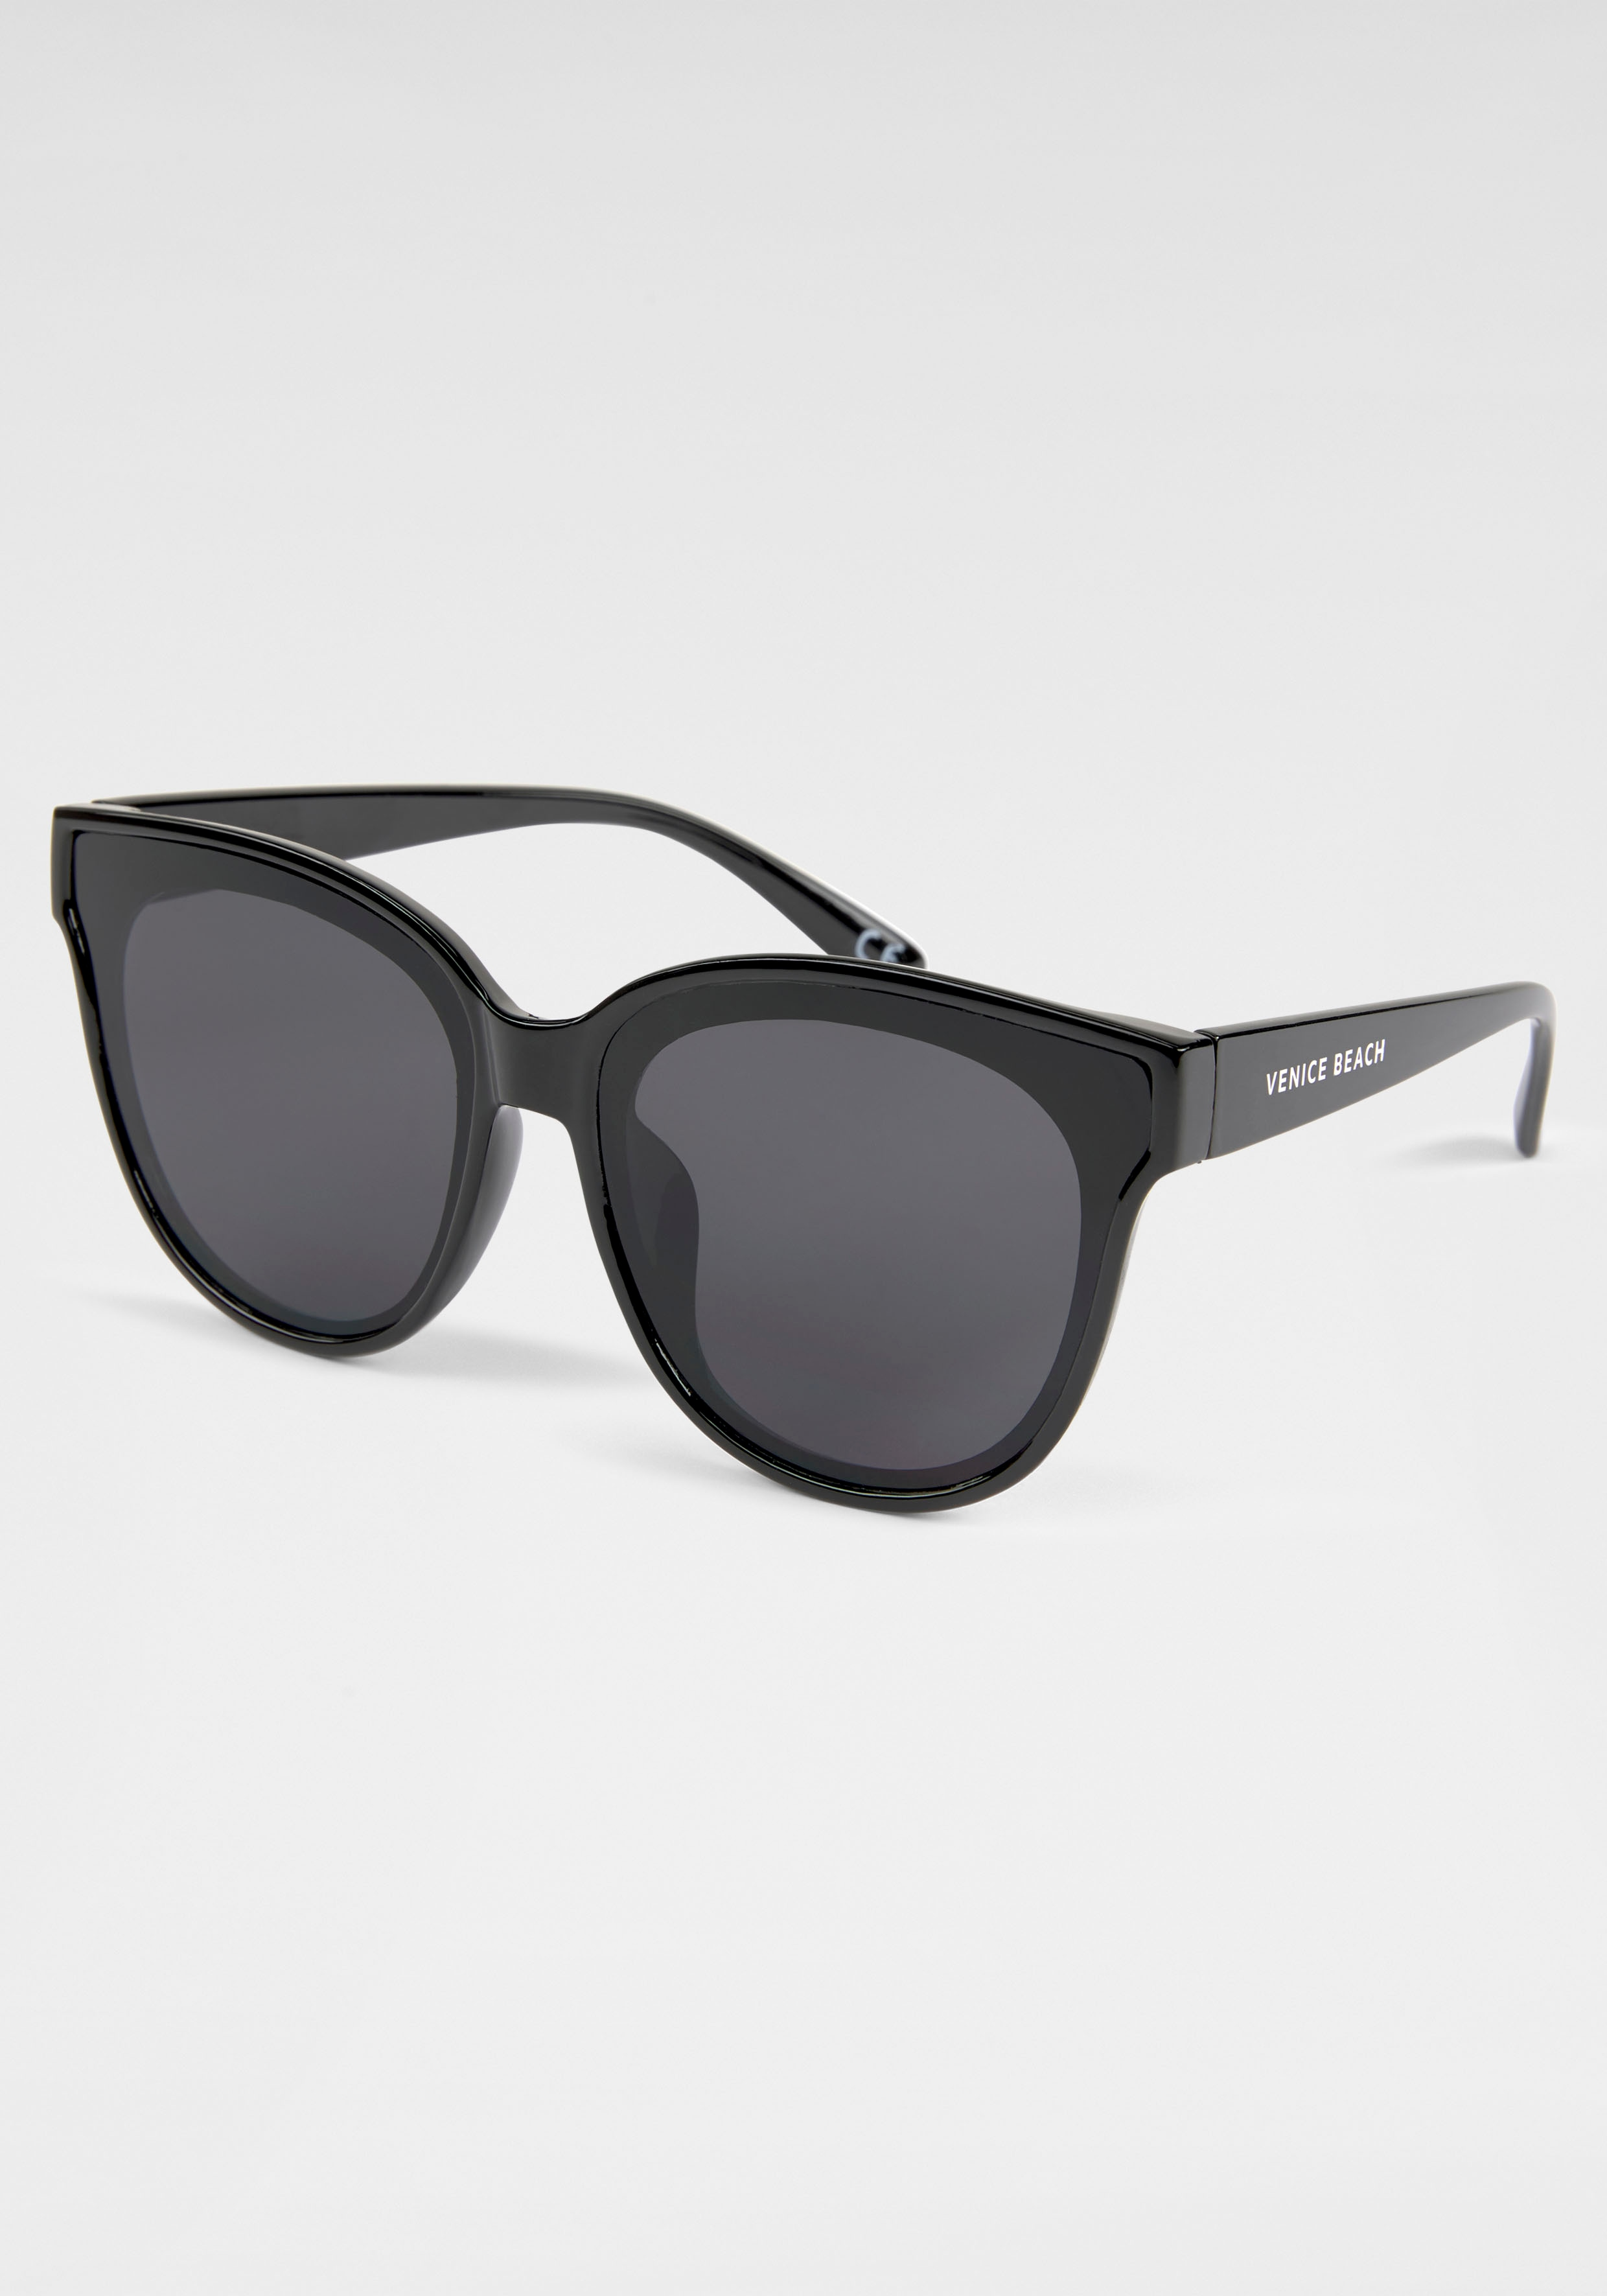 Venice Beach Sonnenbrille, im Cat-Eye Style schwarz Damen Ovale Sonnenbrille Sonnenbrillen Accessoires